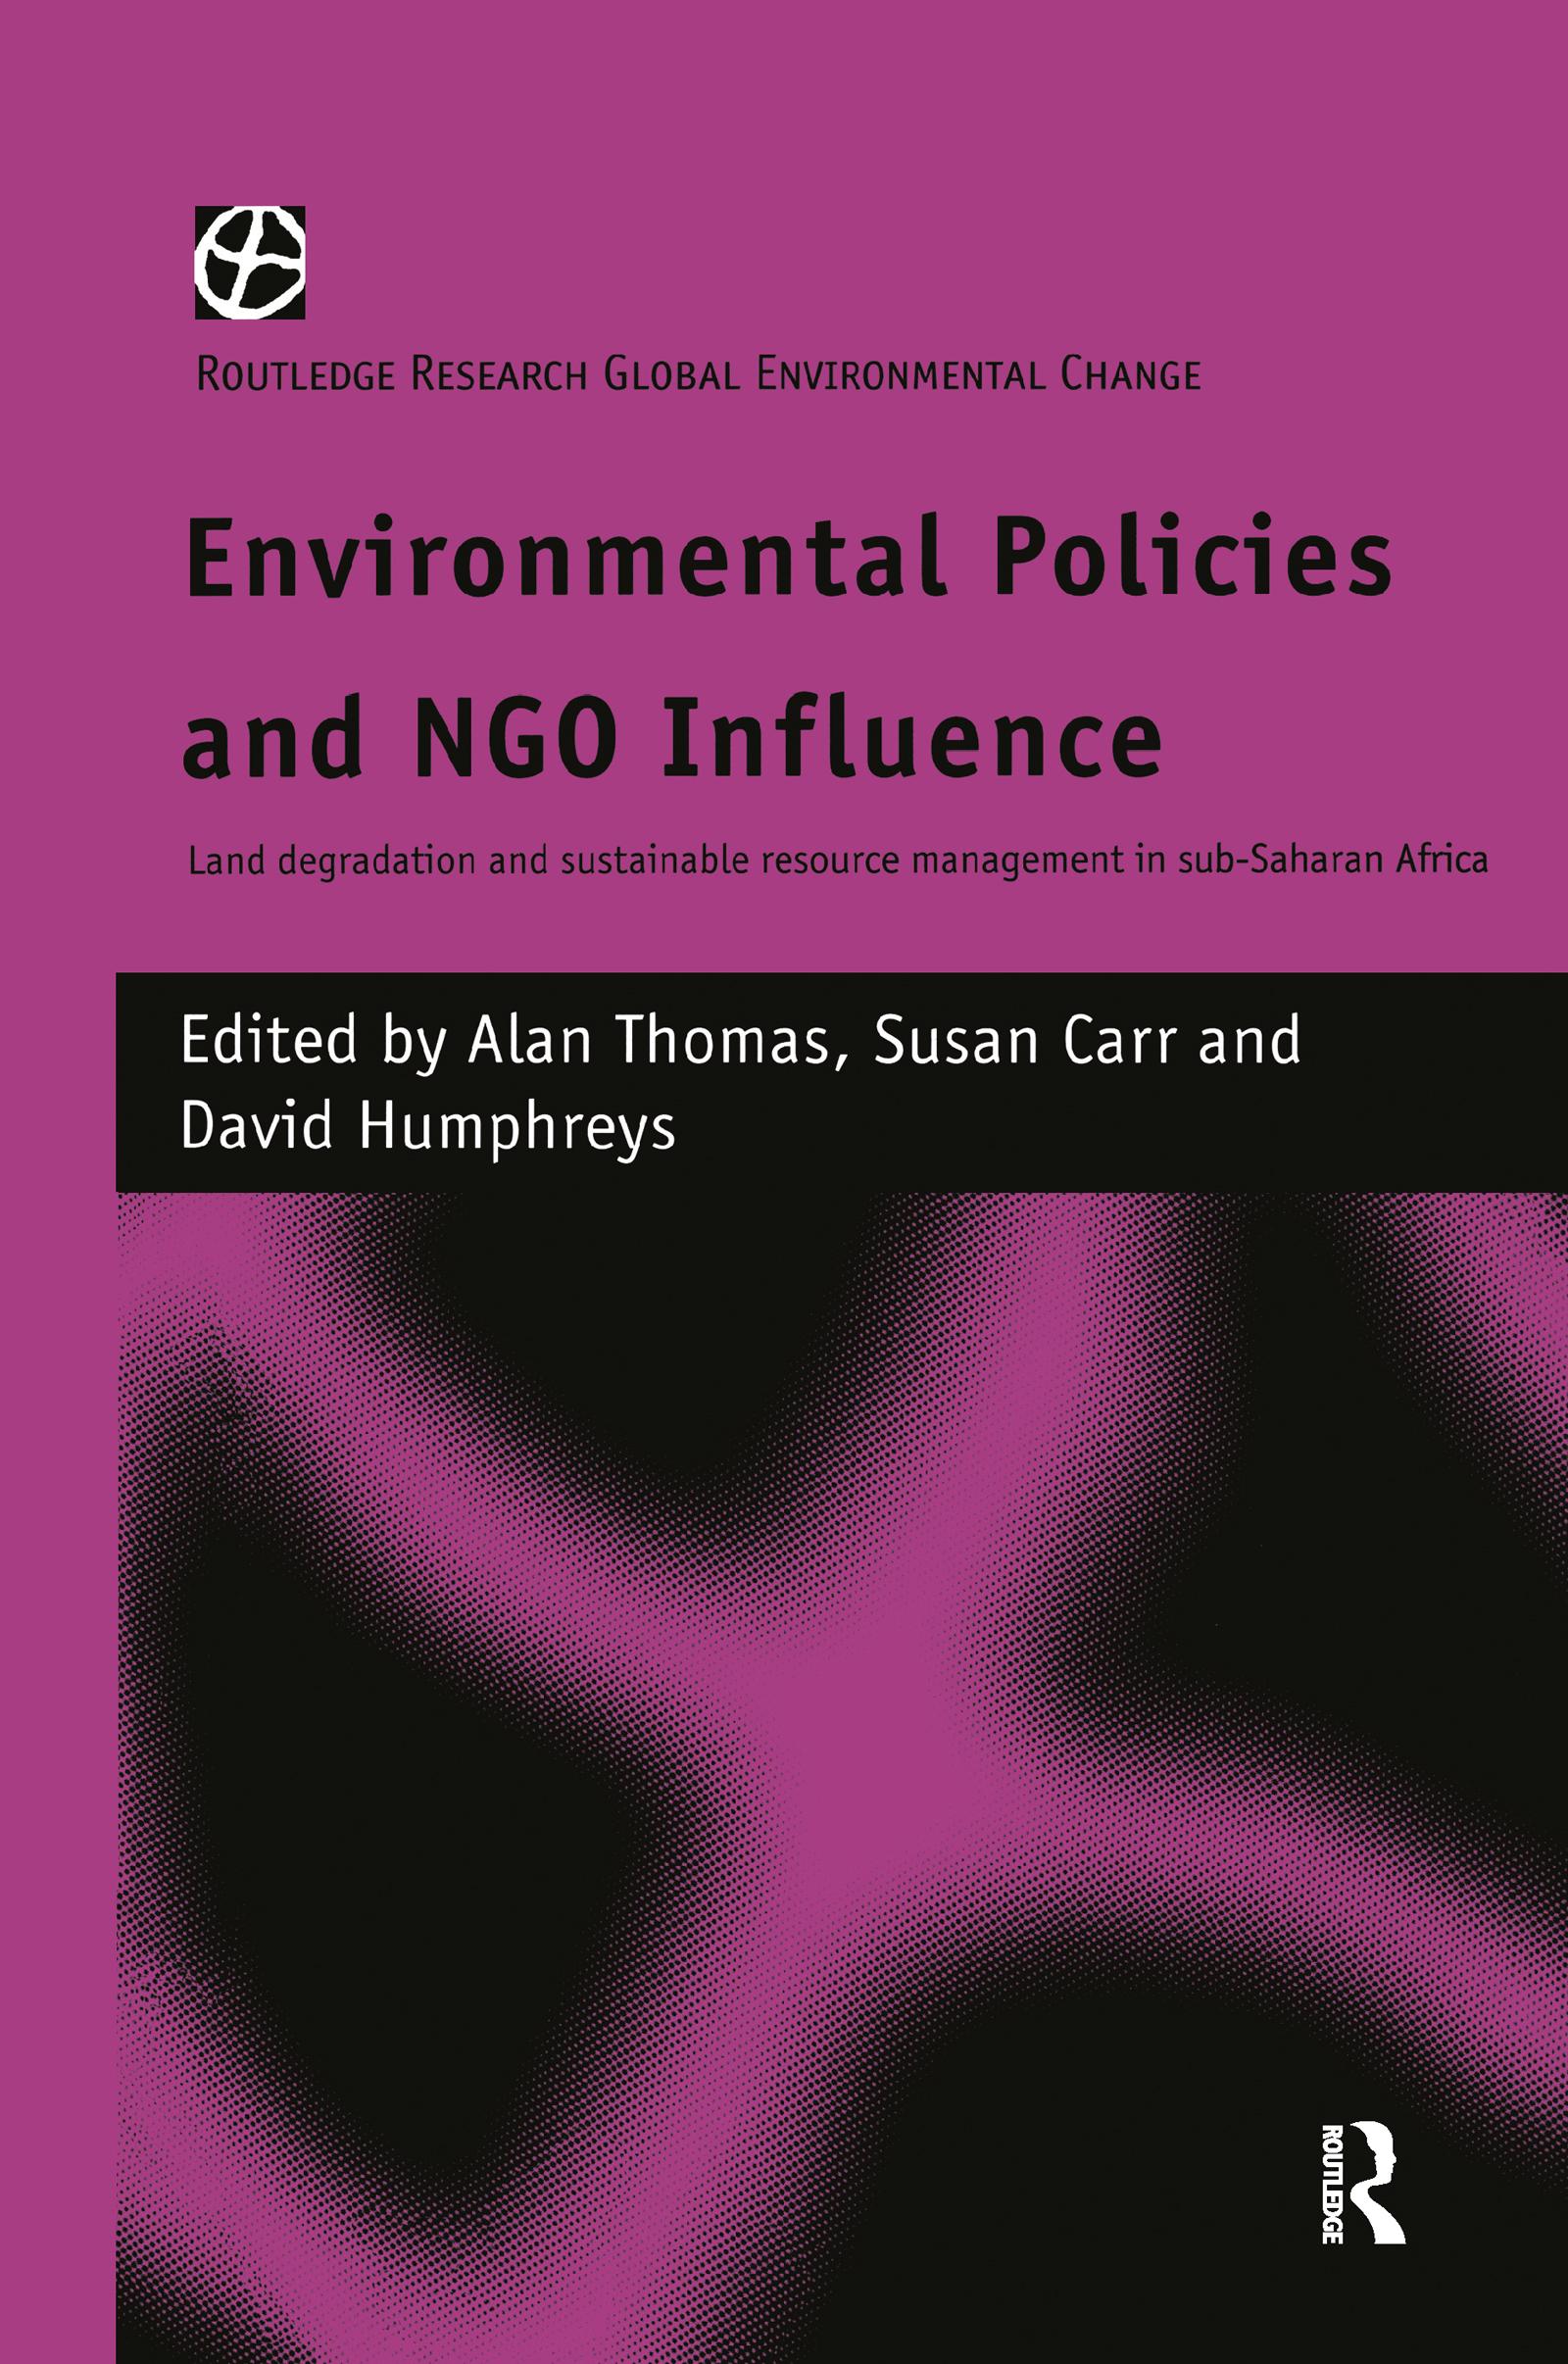 Environmental Policies and NGO Influence